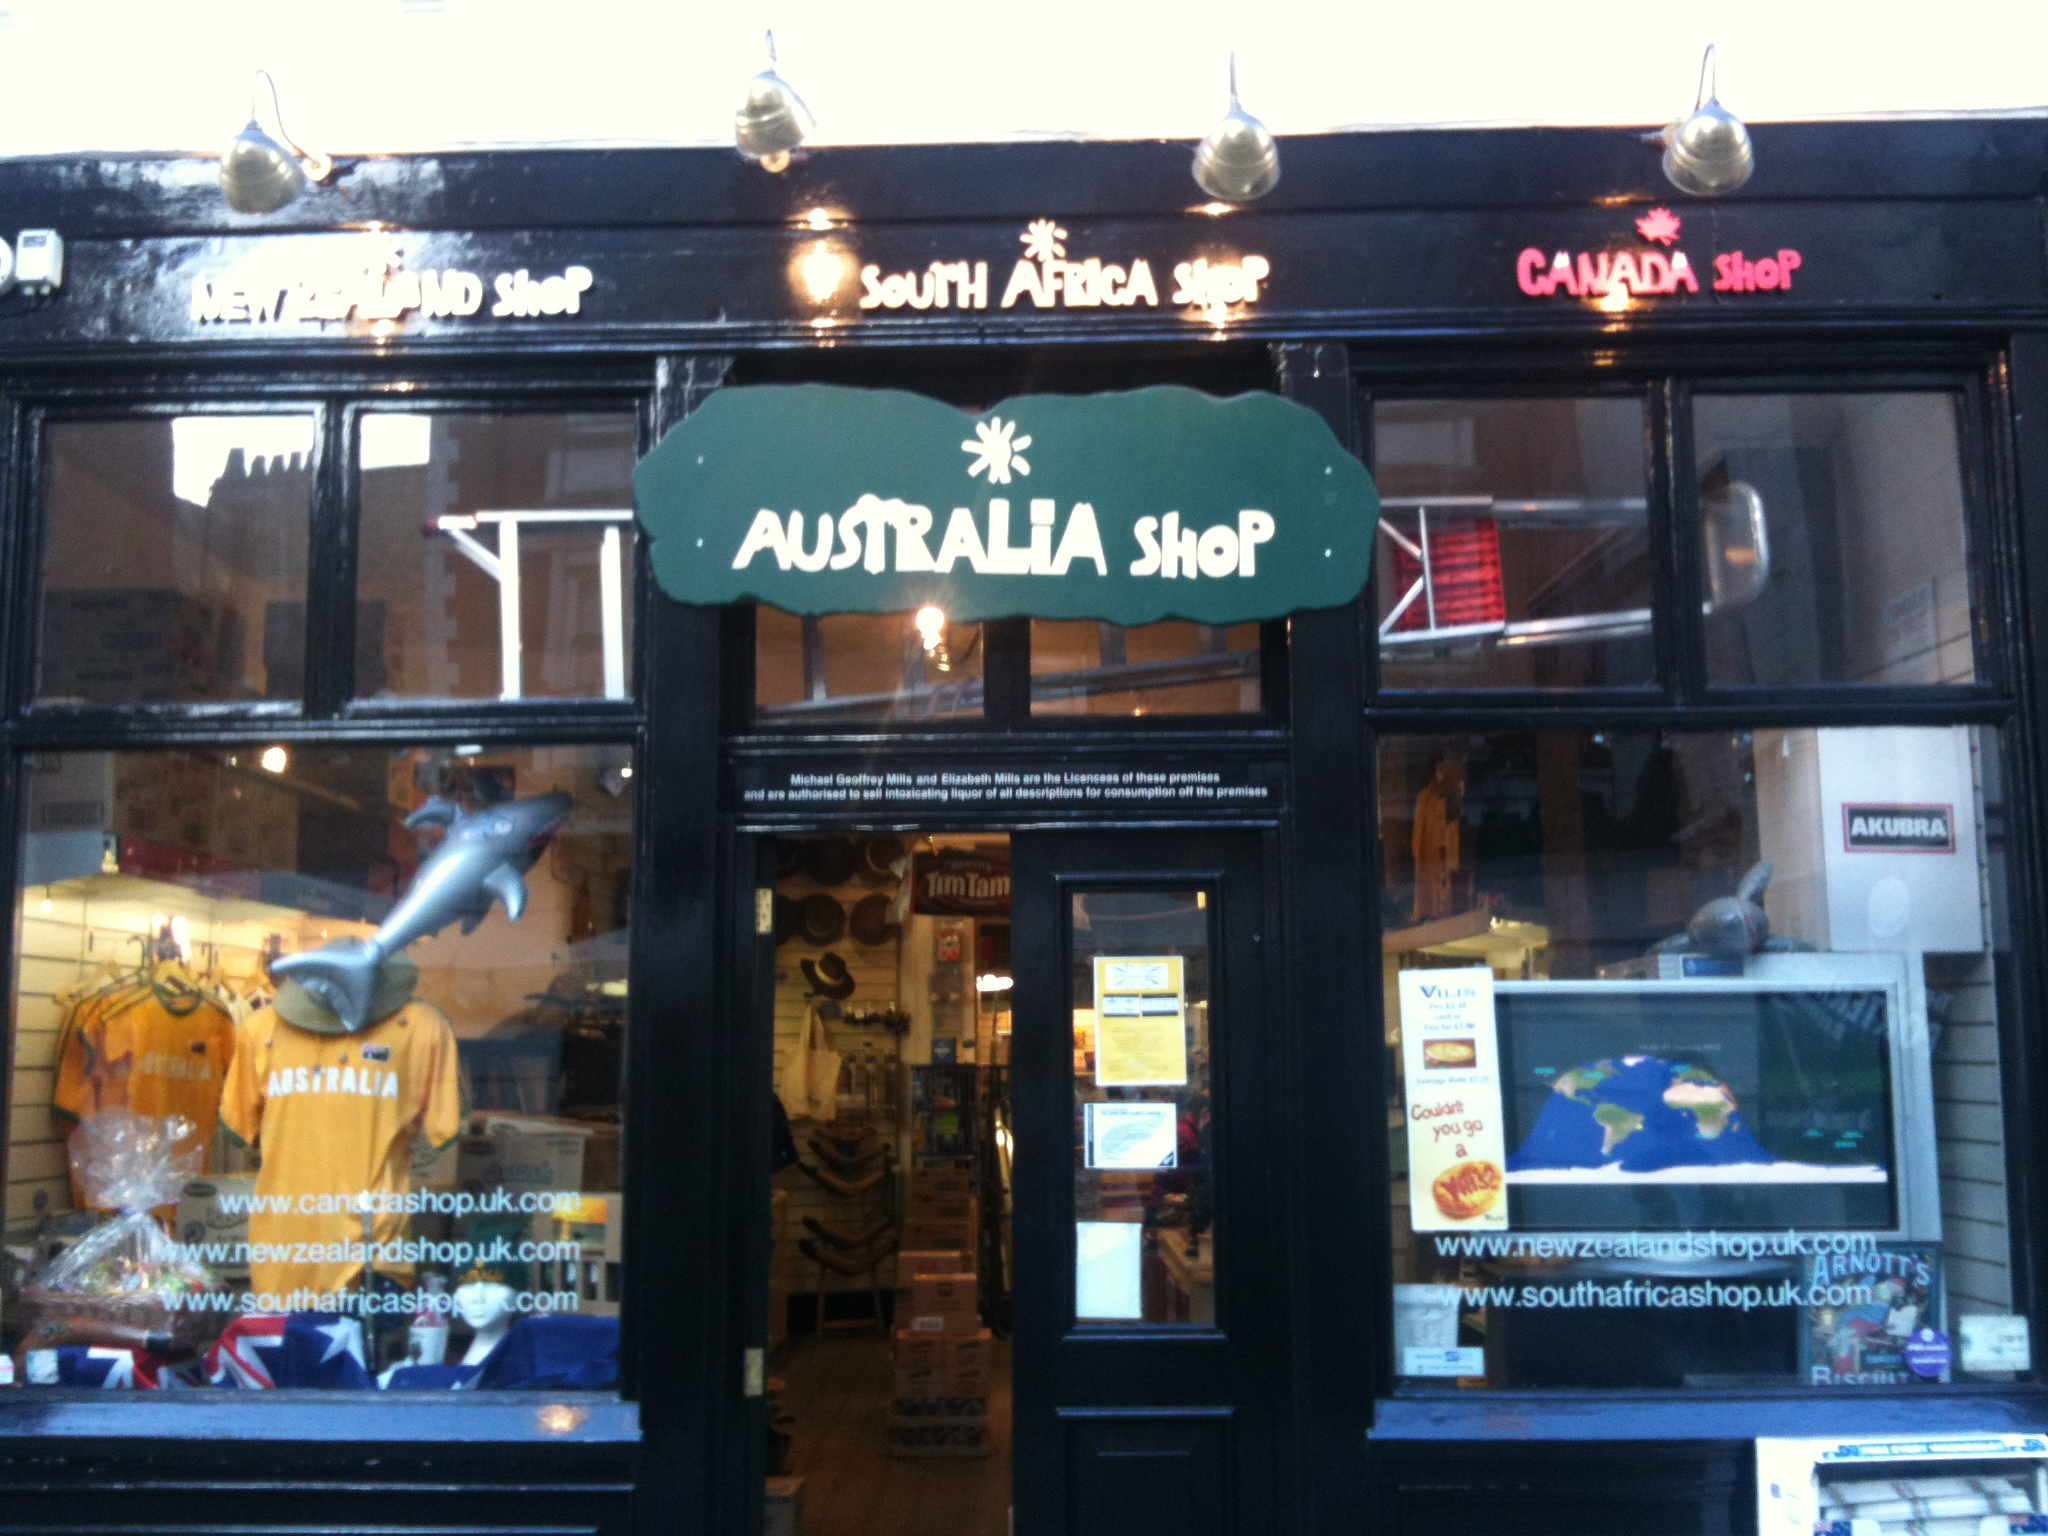 The Australia Shop